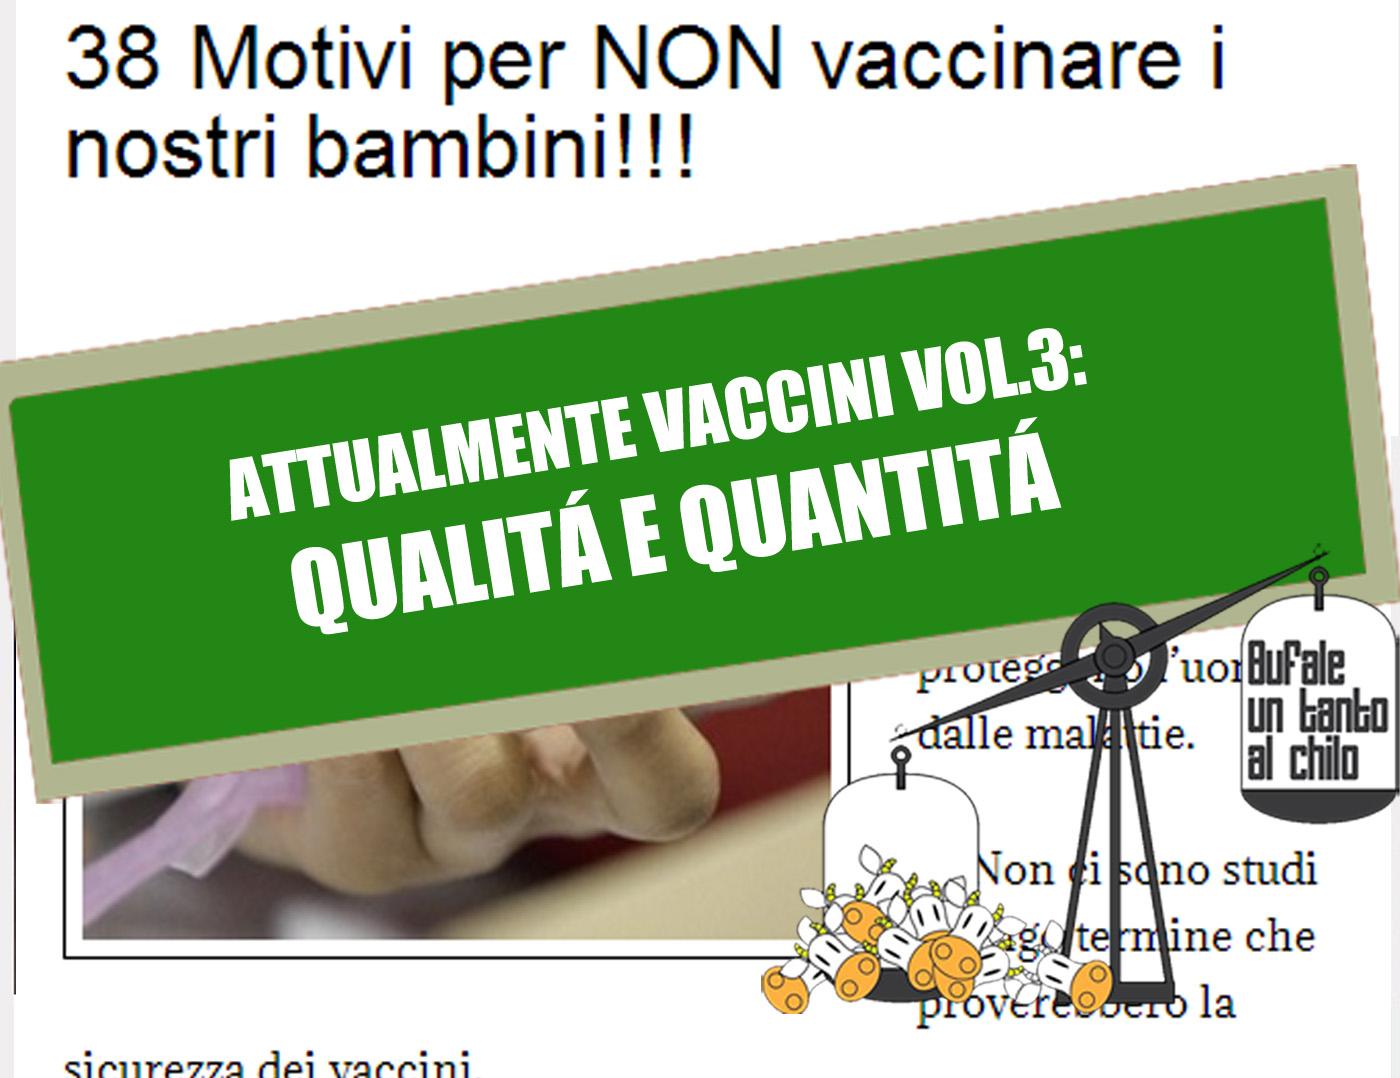 ATT-VACC-VOL3